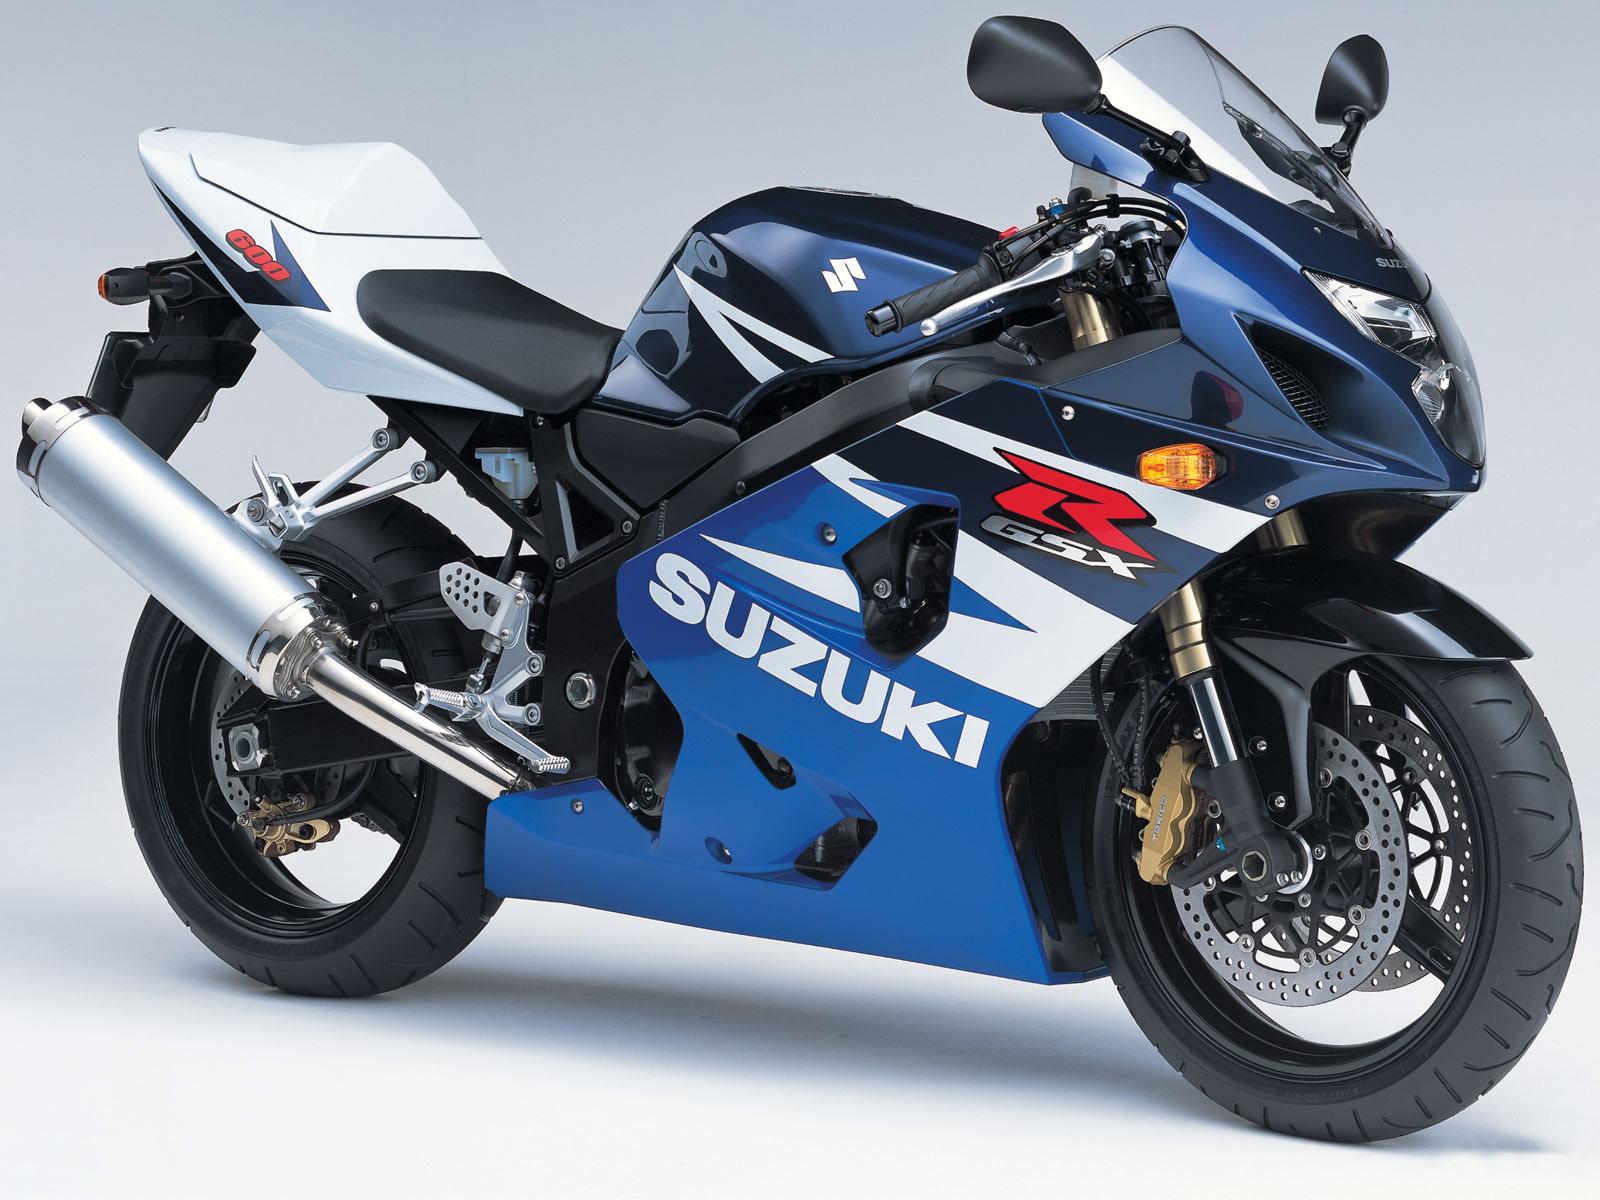 http://1.bp.blogspot.com/_ja0nvj5Jato/TIJ9qahbGdI/AAAAAAAAIFA/I_4jwnbh6sg/s1600/suzuki_GSX-R_600_2004_motorcycle_pictures-4.jpg